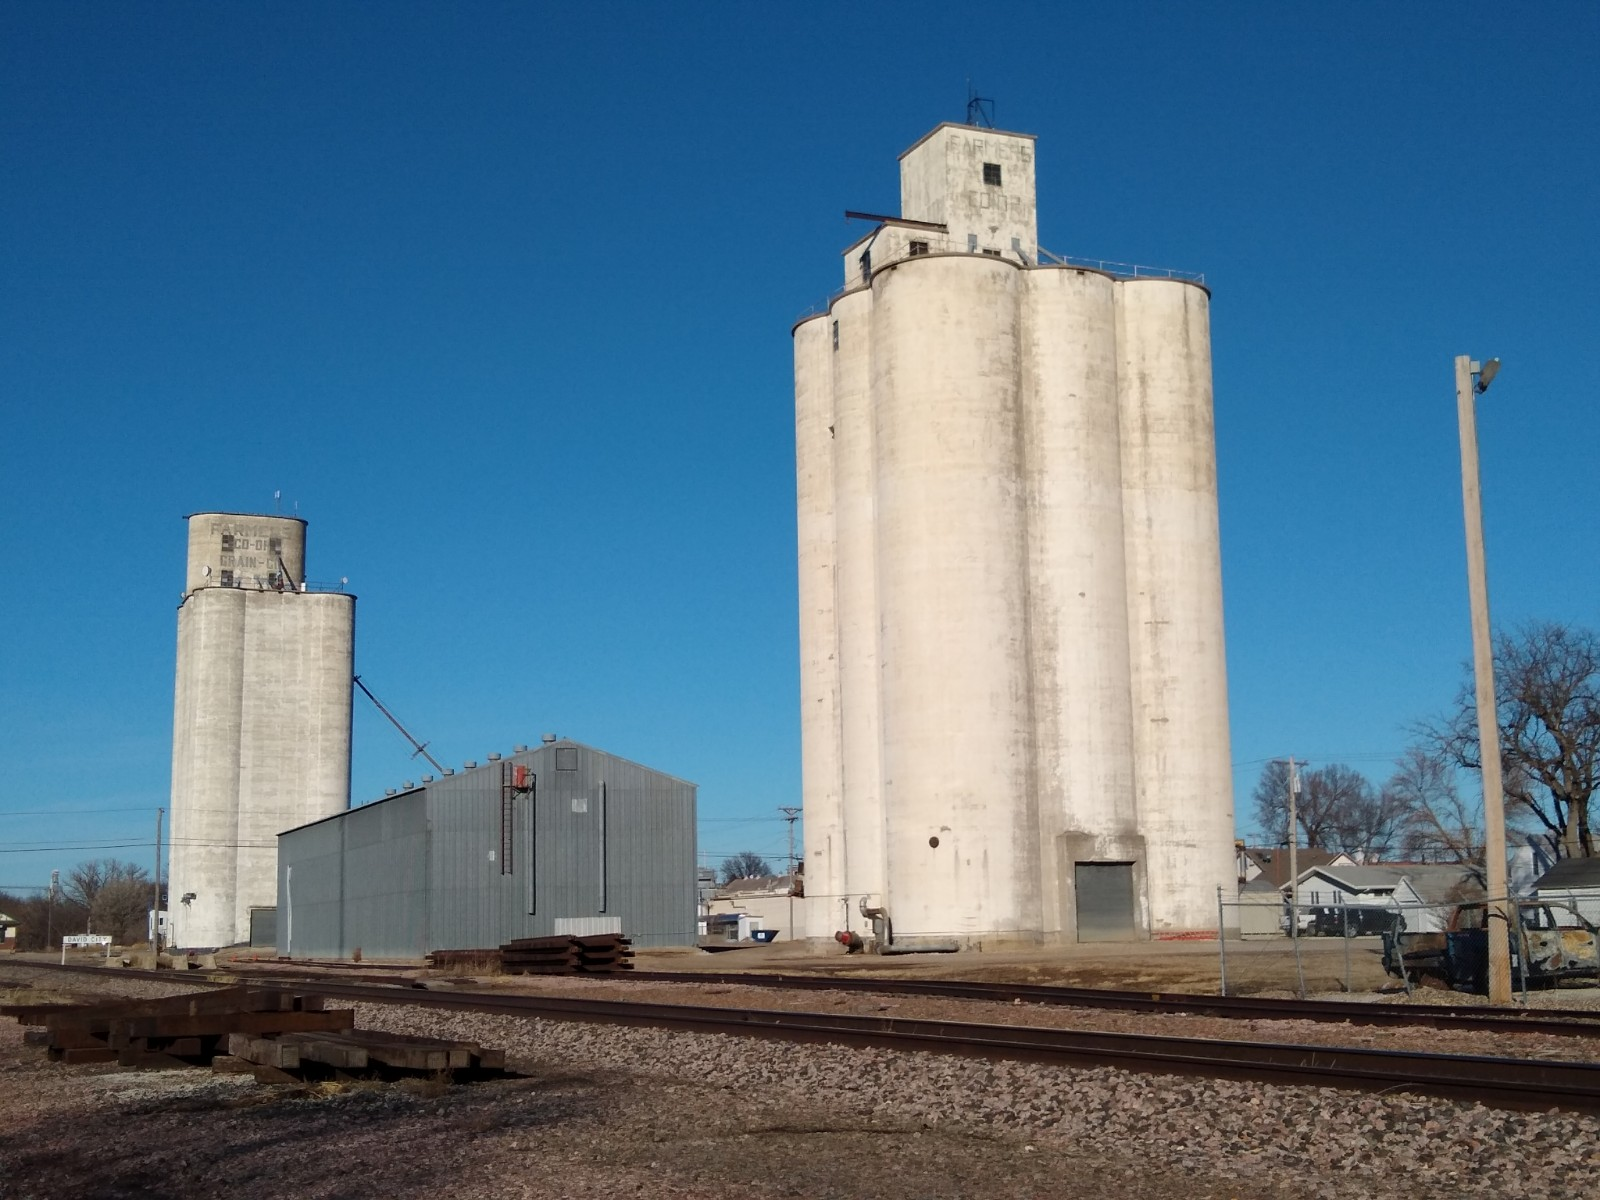 View of David City grain elevators